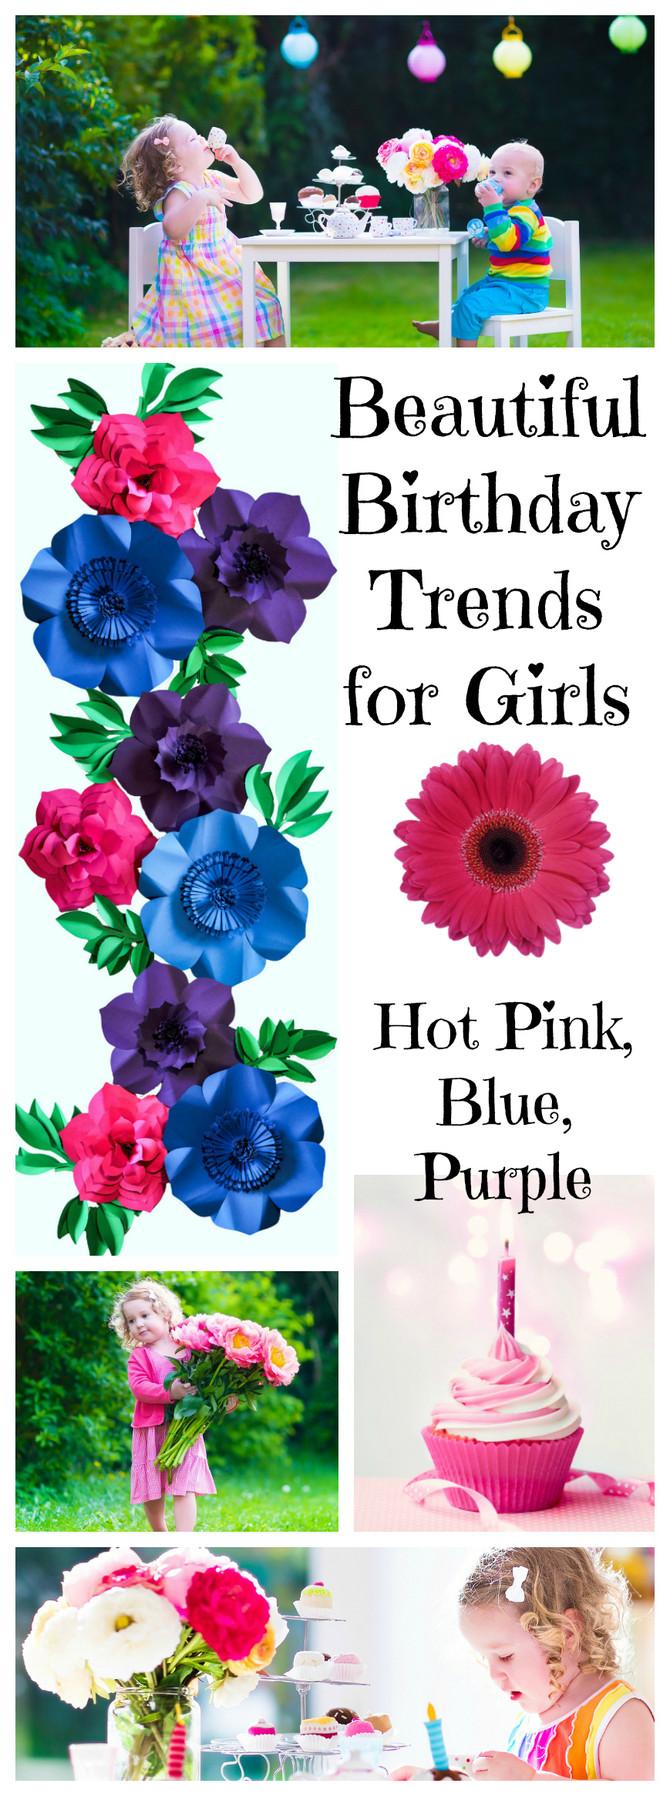 Pink, Purple, Blue: Birthday Trends